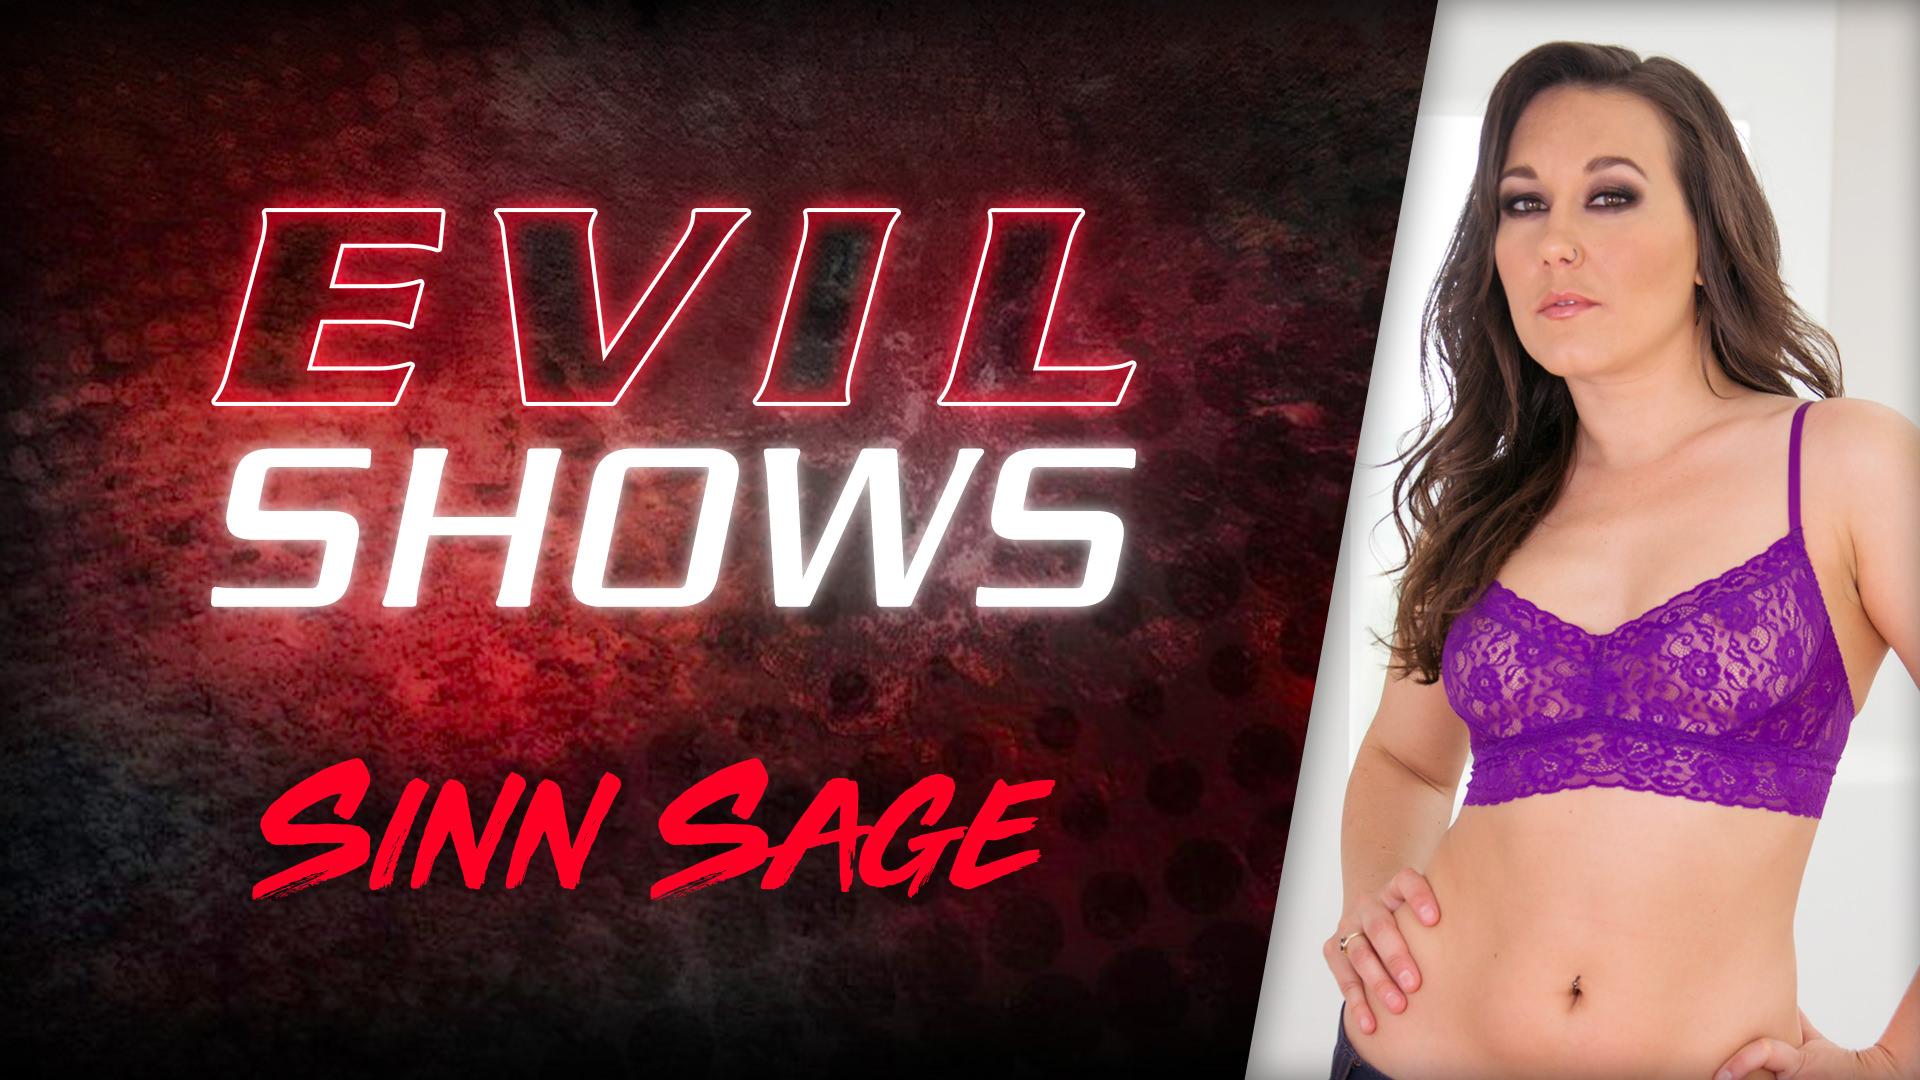 Evil Shows - Sinn Sage Escena 1